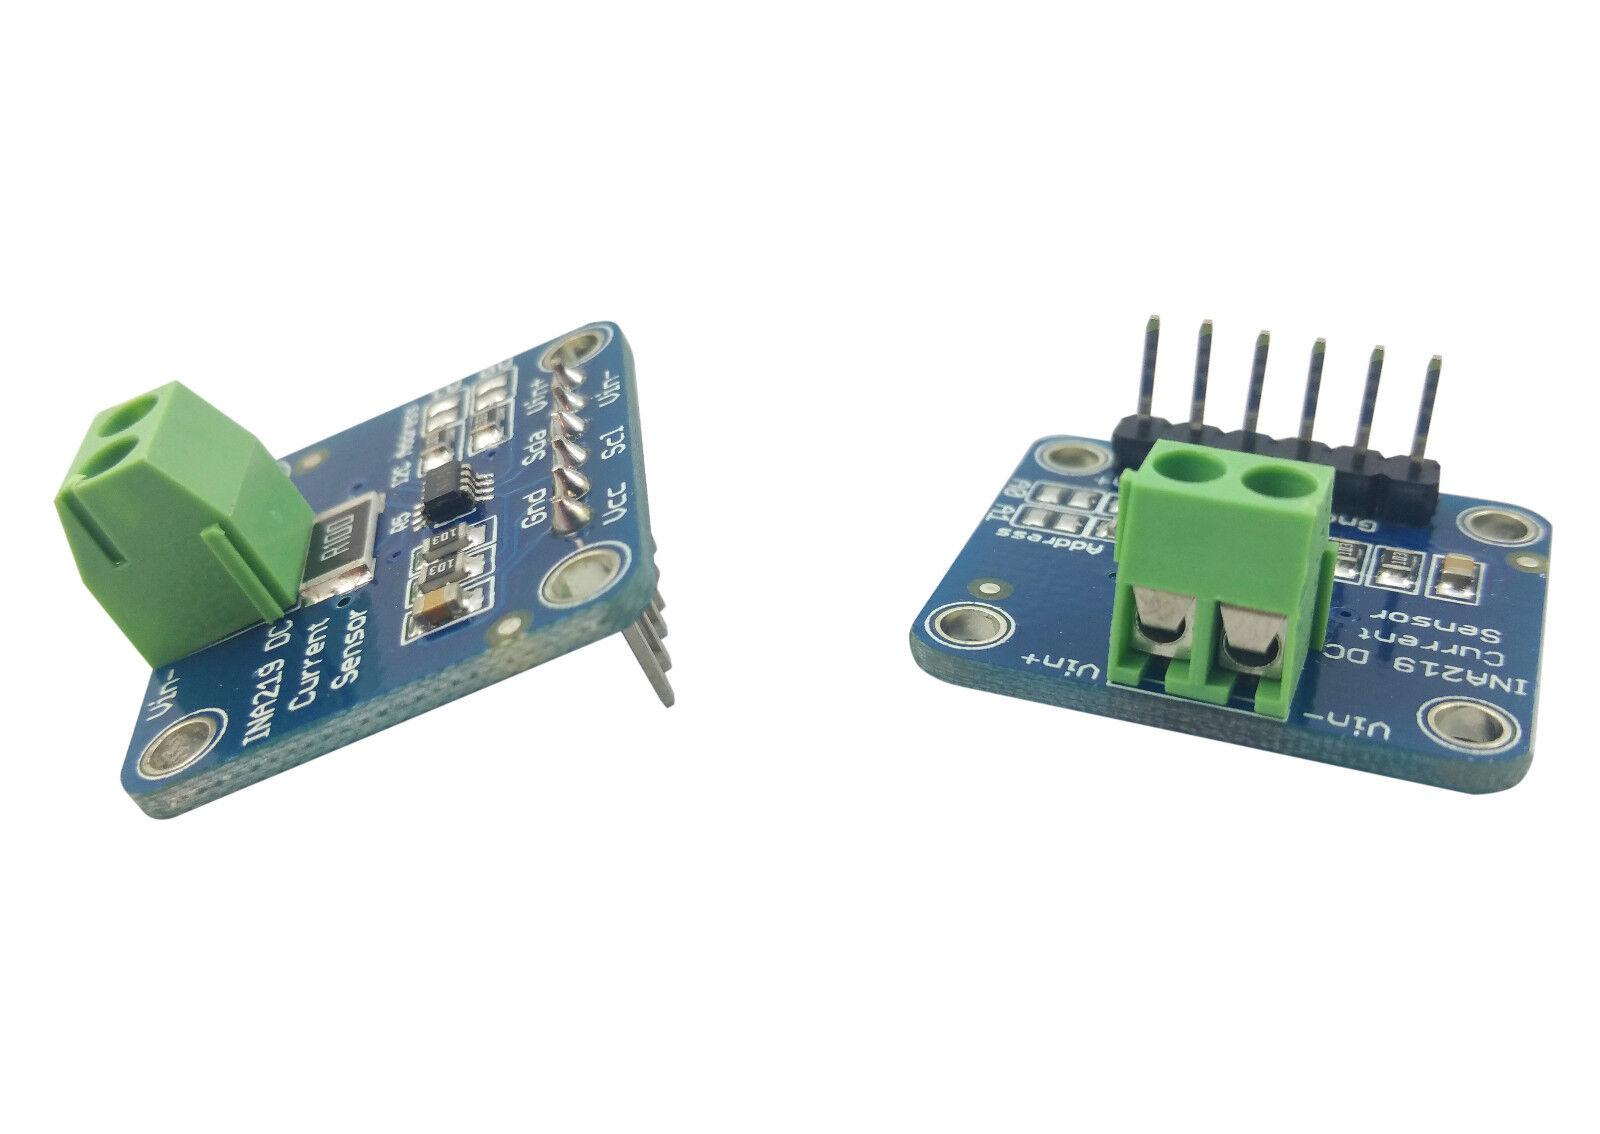 2pcs Ina219 Dc Current Sensor Voltage Test Module Breakout Board I2c Sensing Relay Nz For Arduino